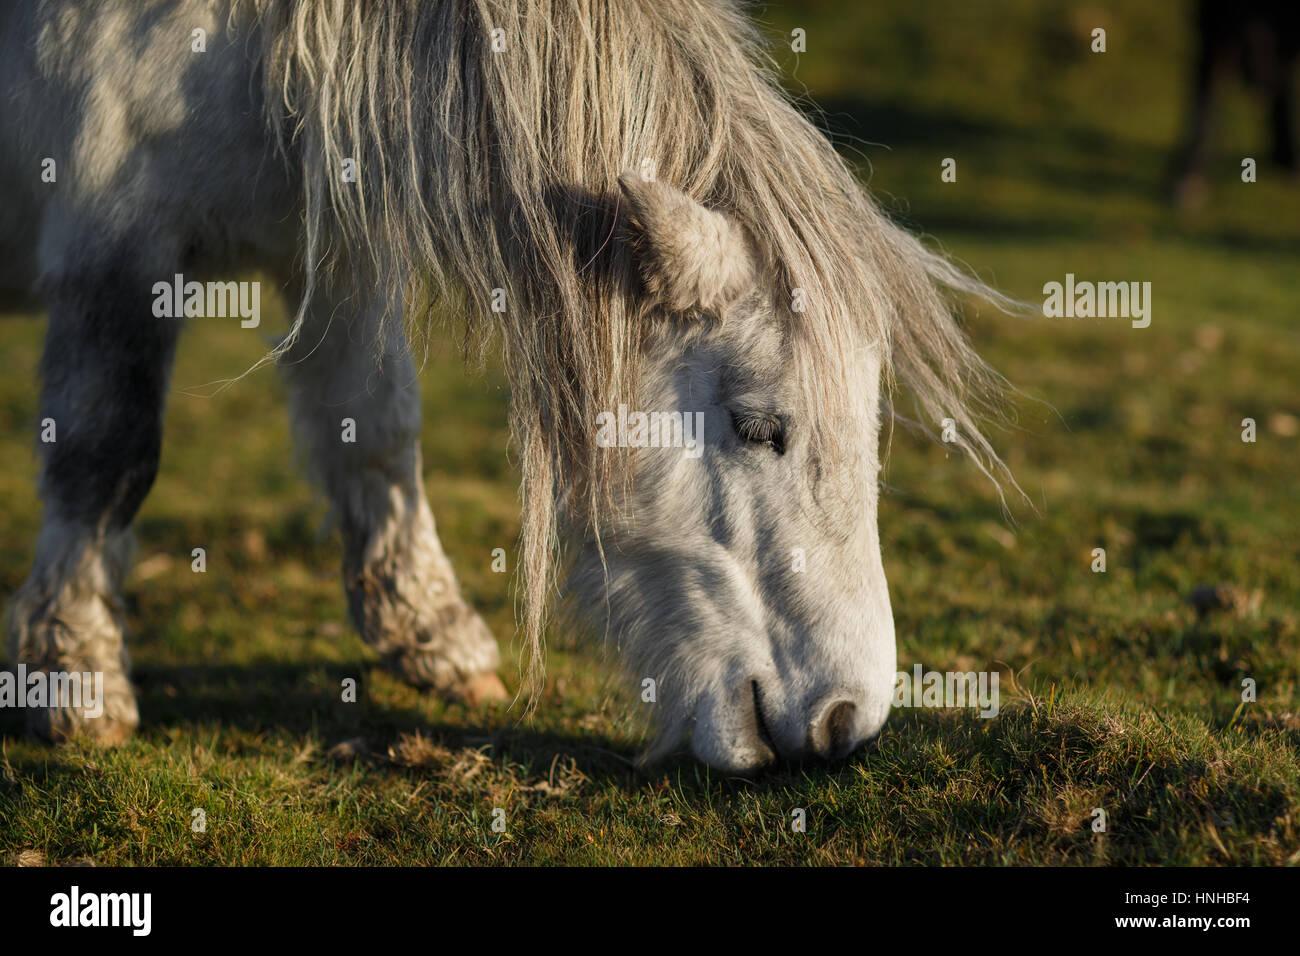 Dartmoor Pony - Stock Image